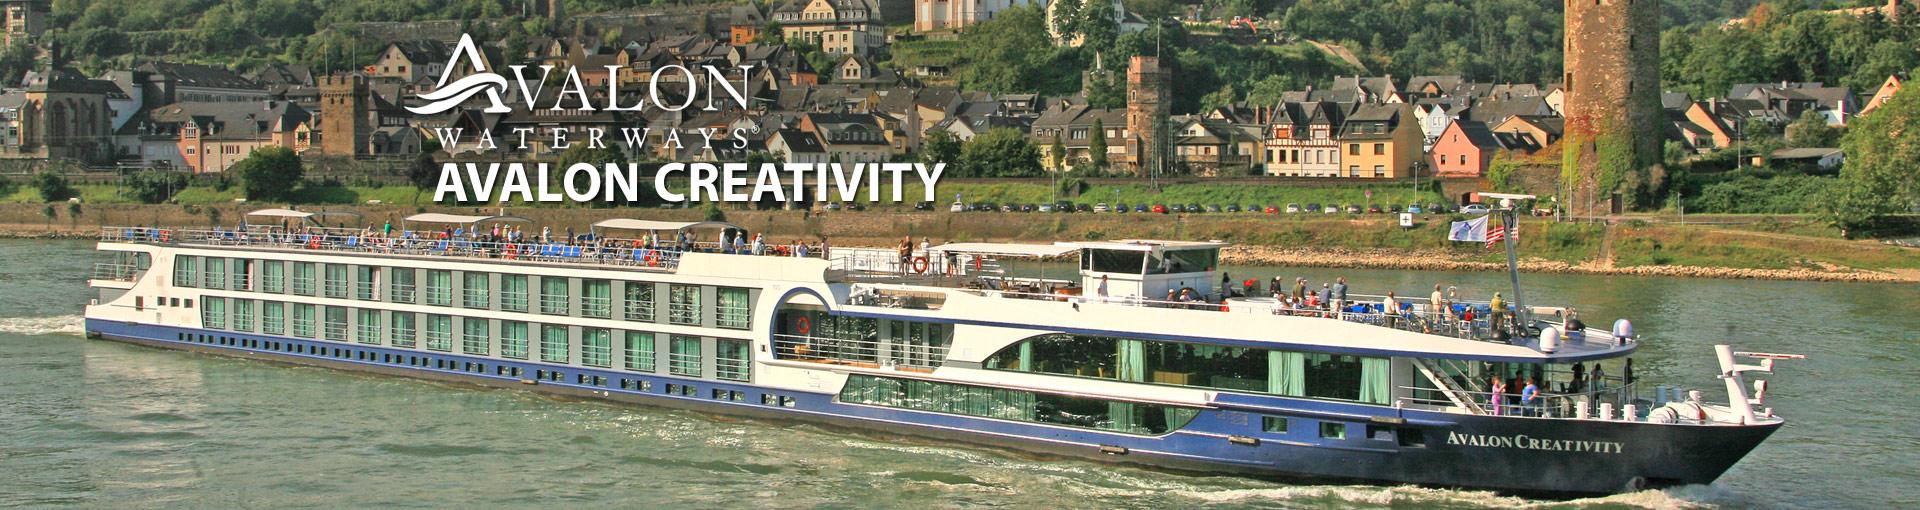 Avalon Waterways Creativity river cruise ship